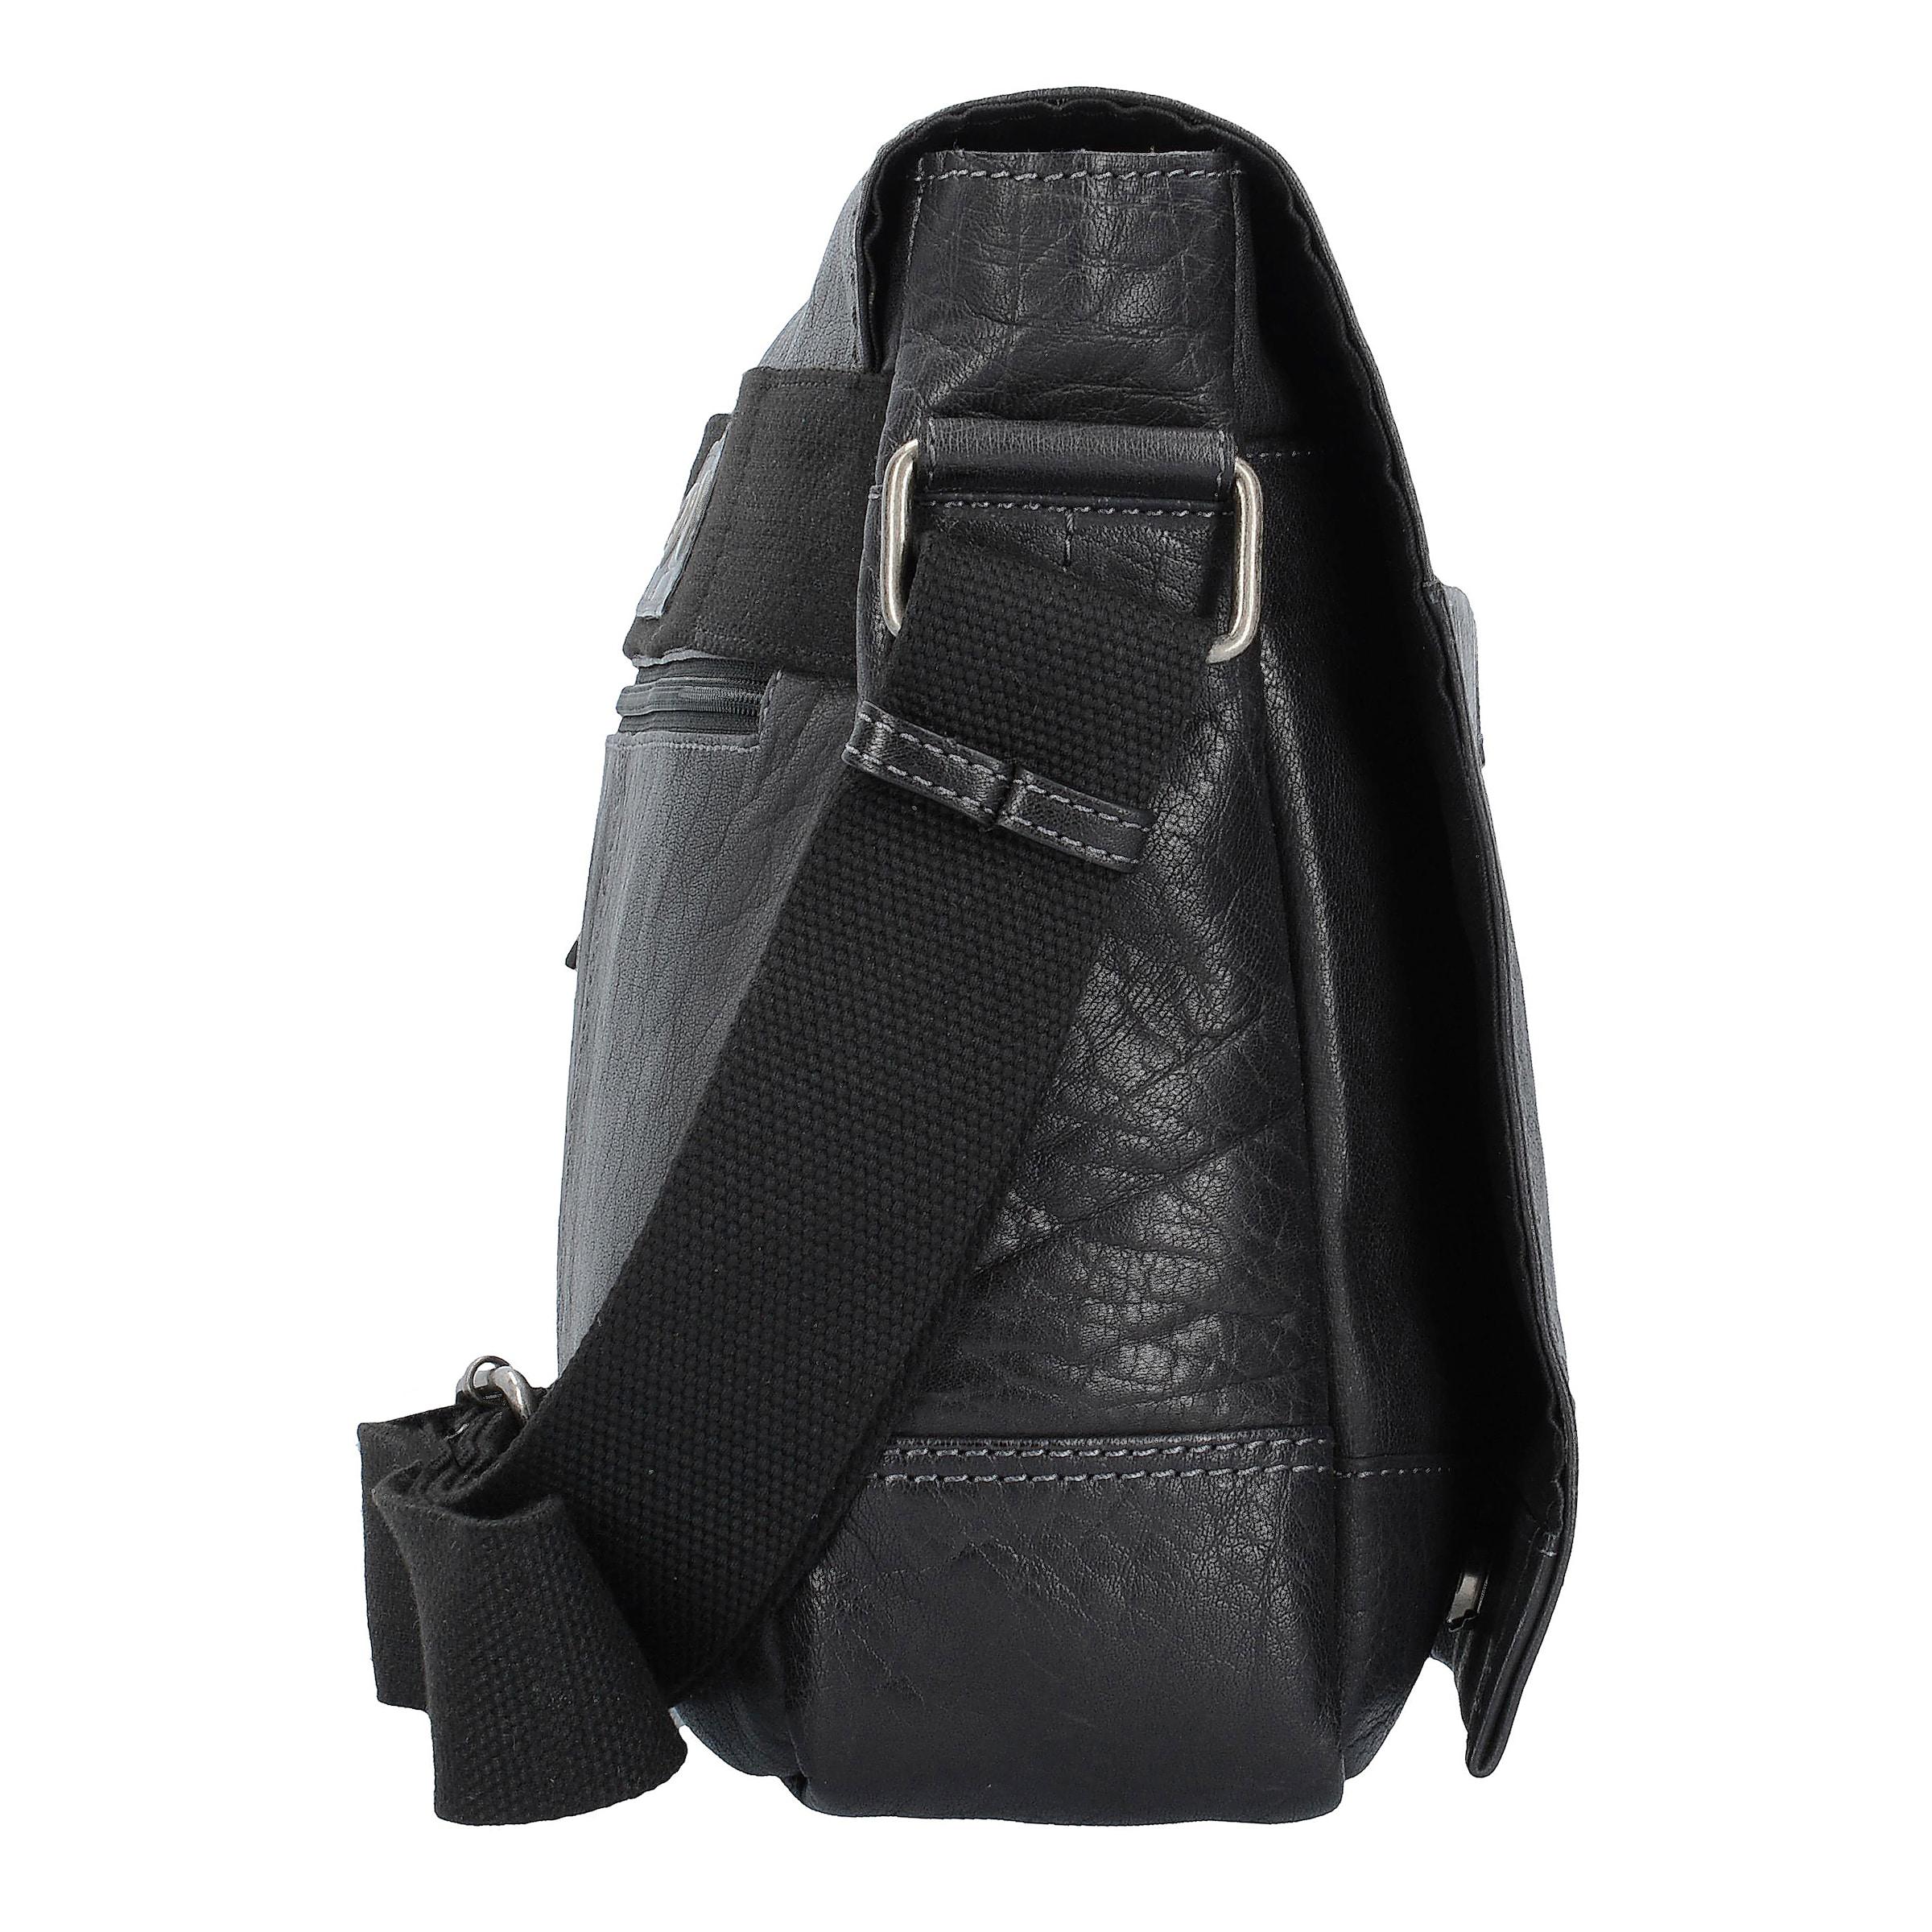 CAMEL ACTIVE Ontario Messenger Businesstasche Leder 40 cm Laptopfach Steckdose Authentisch giWrxIcl